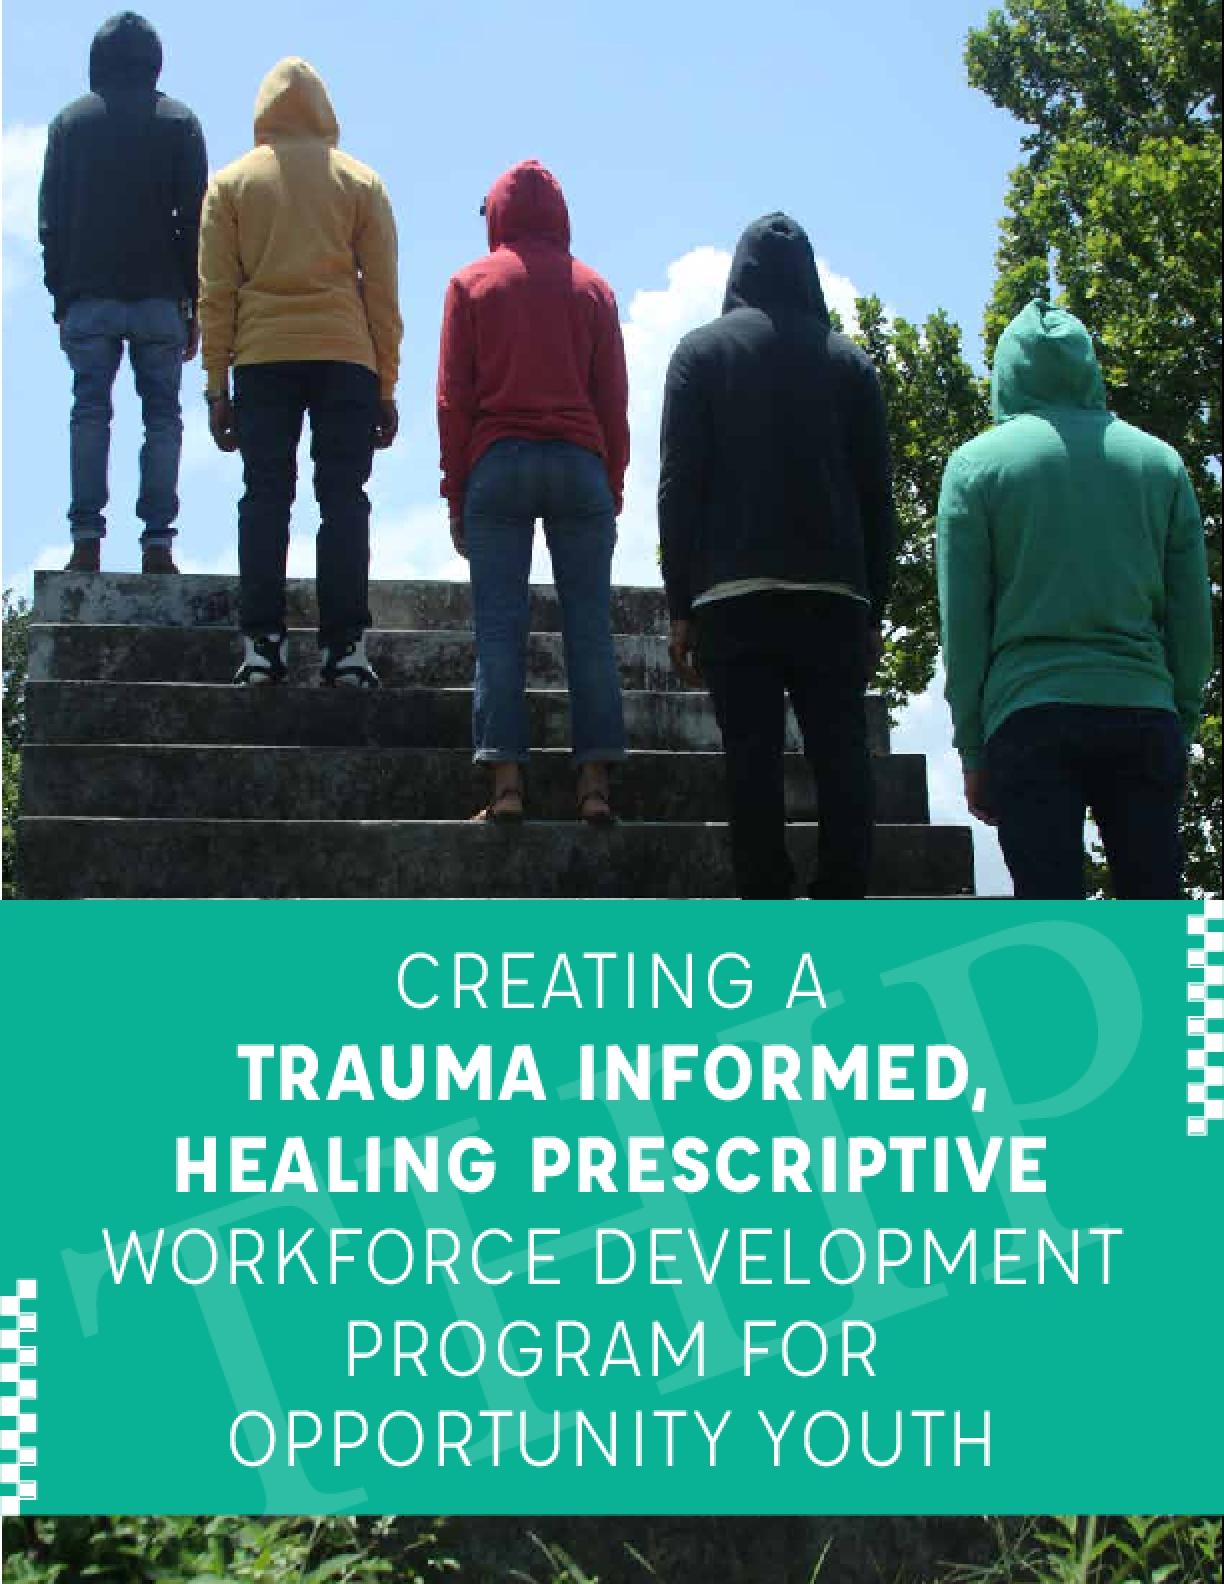 Creating a Trauma Informed Healing Prescriptive: Workforce Development Program for Opportunity Youth